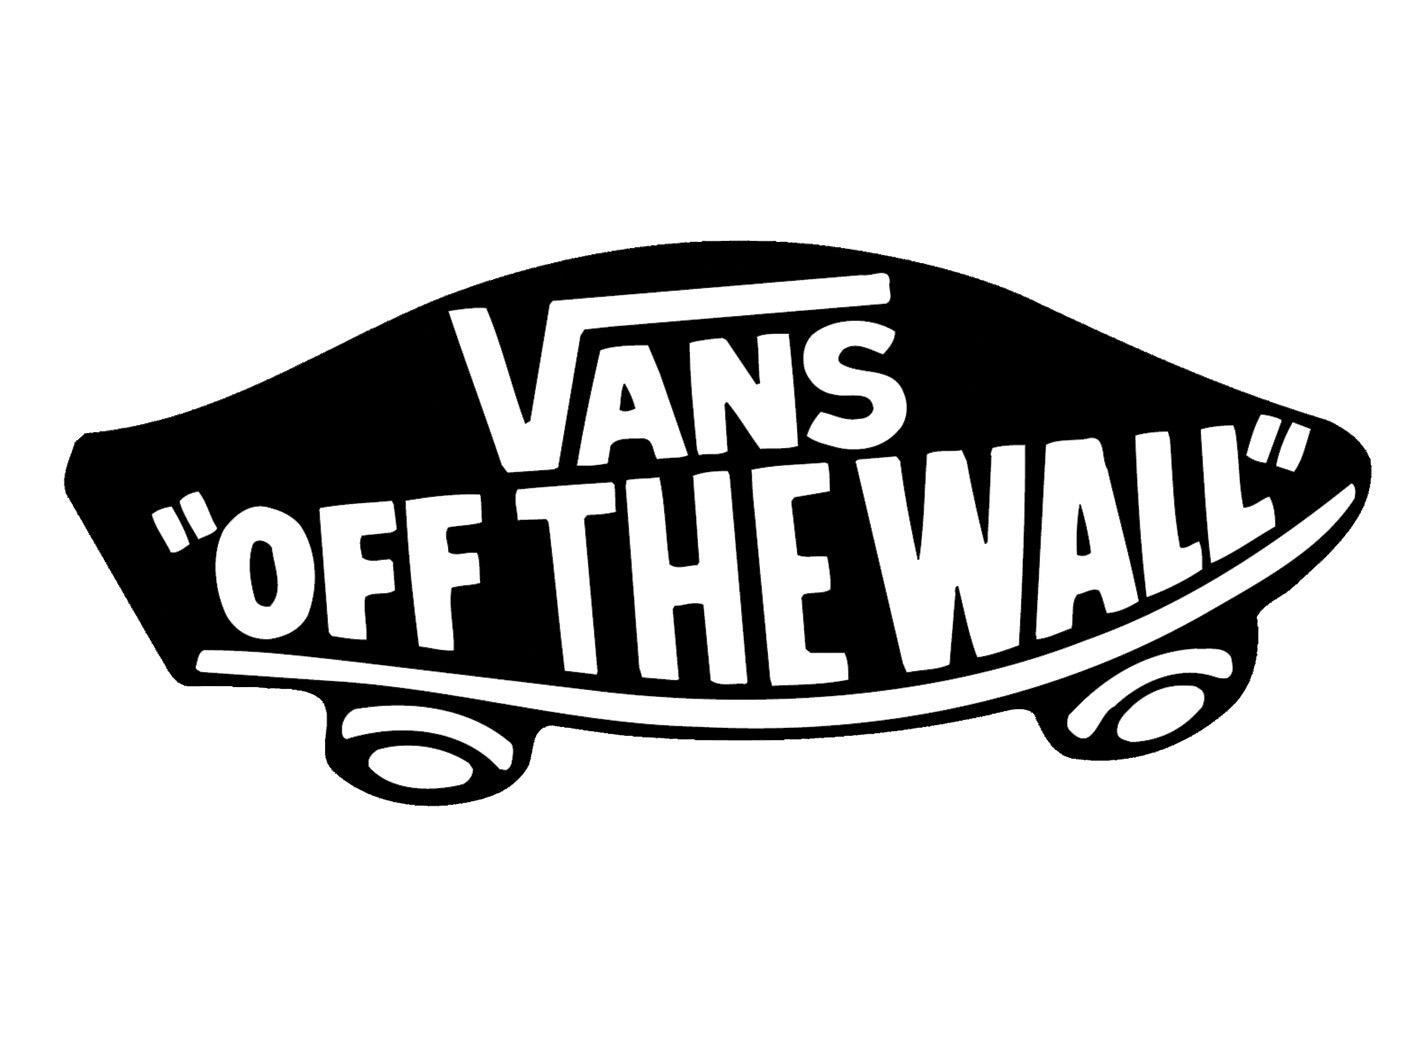 Vans Off The Wall Wallpaper - WallpaperSafari 4d6a5caaae